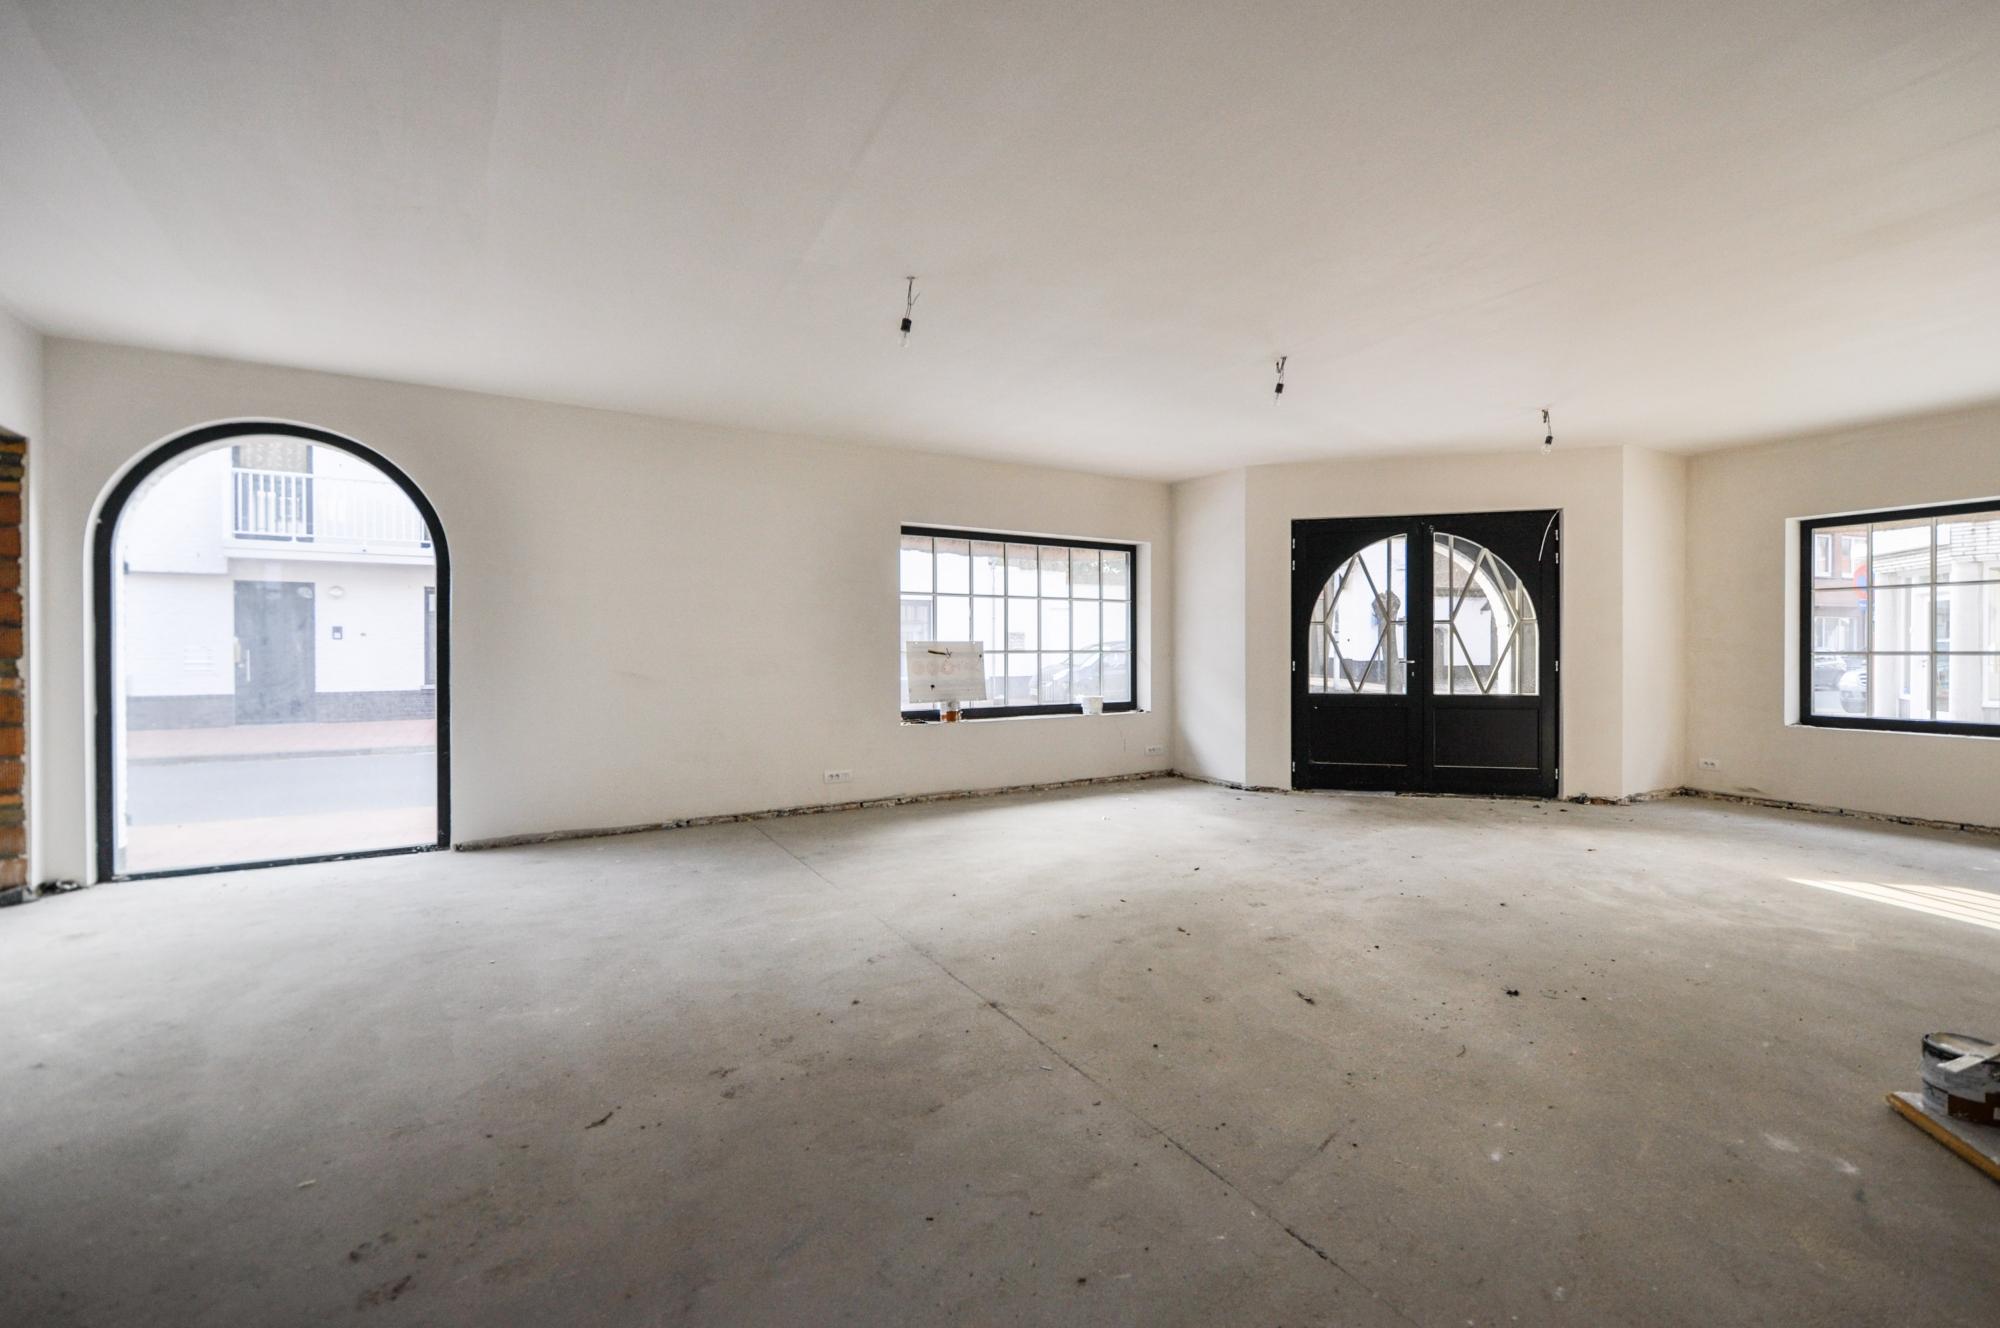 Verkoop huis t3 f3 knokke heist nieuwbouwwoning graaf for Huis verkoop site